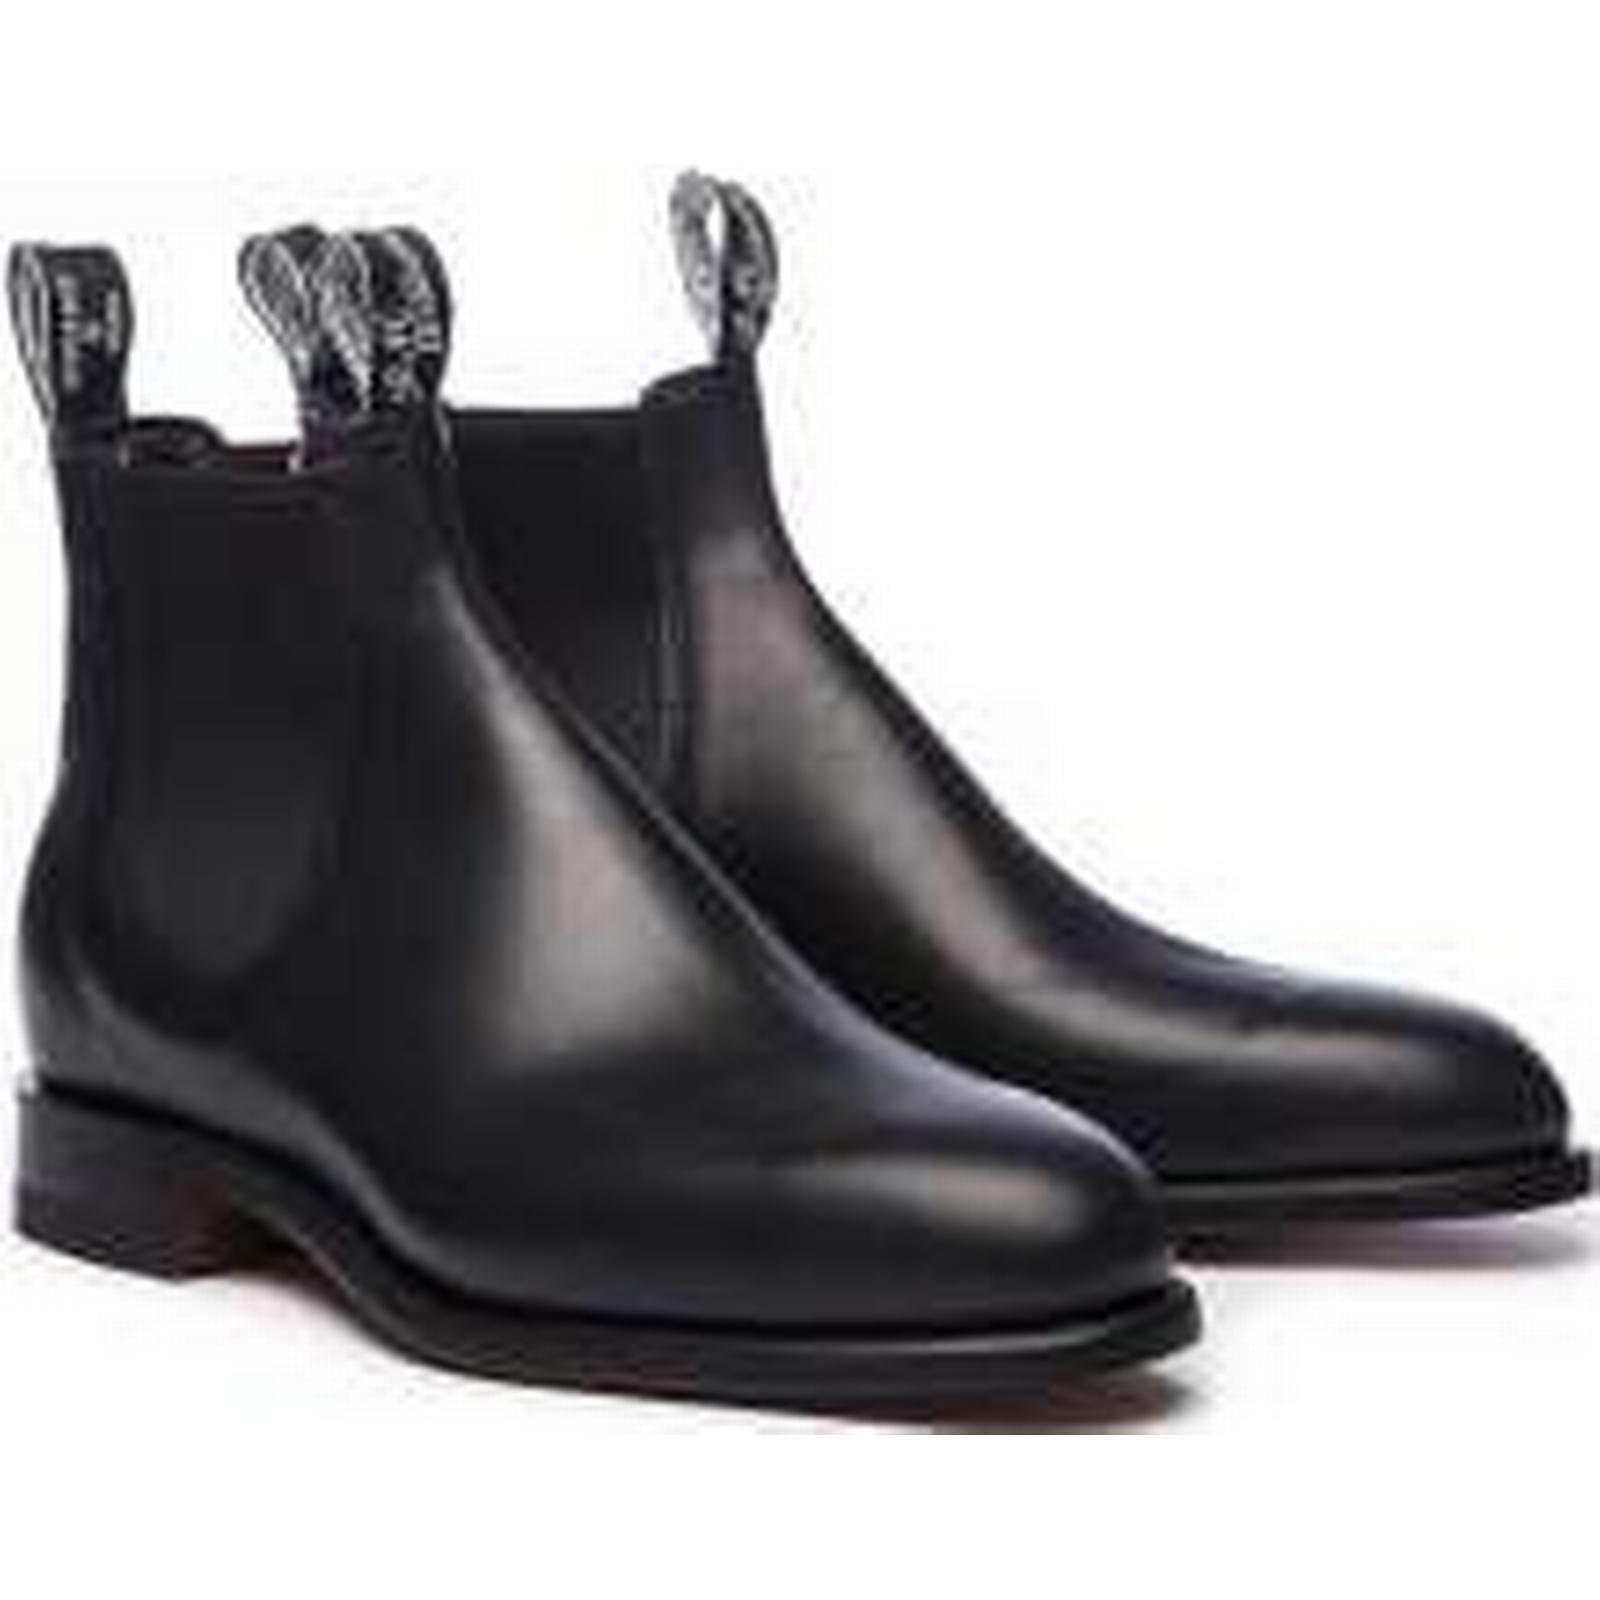 R.M. Williams Comfort Turnout Boots, UK8 Black Regular G Fit, UK8 Boots, 1b746c